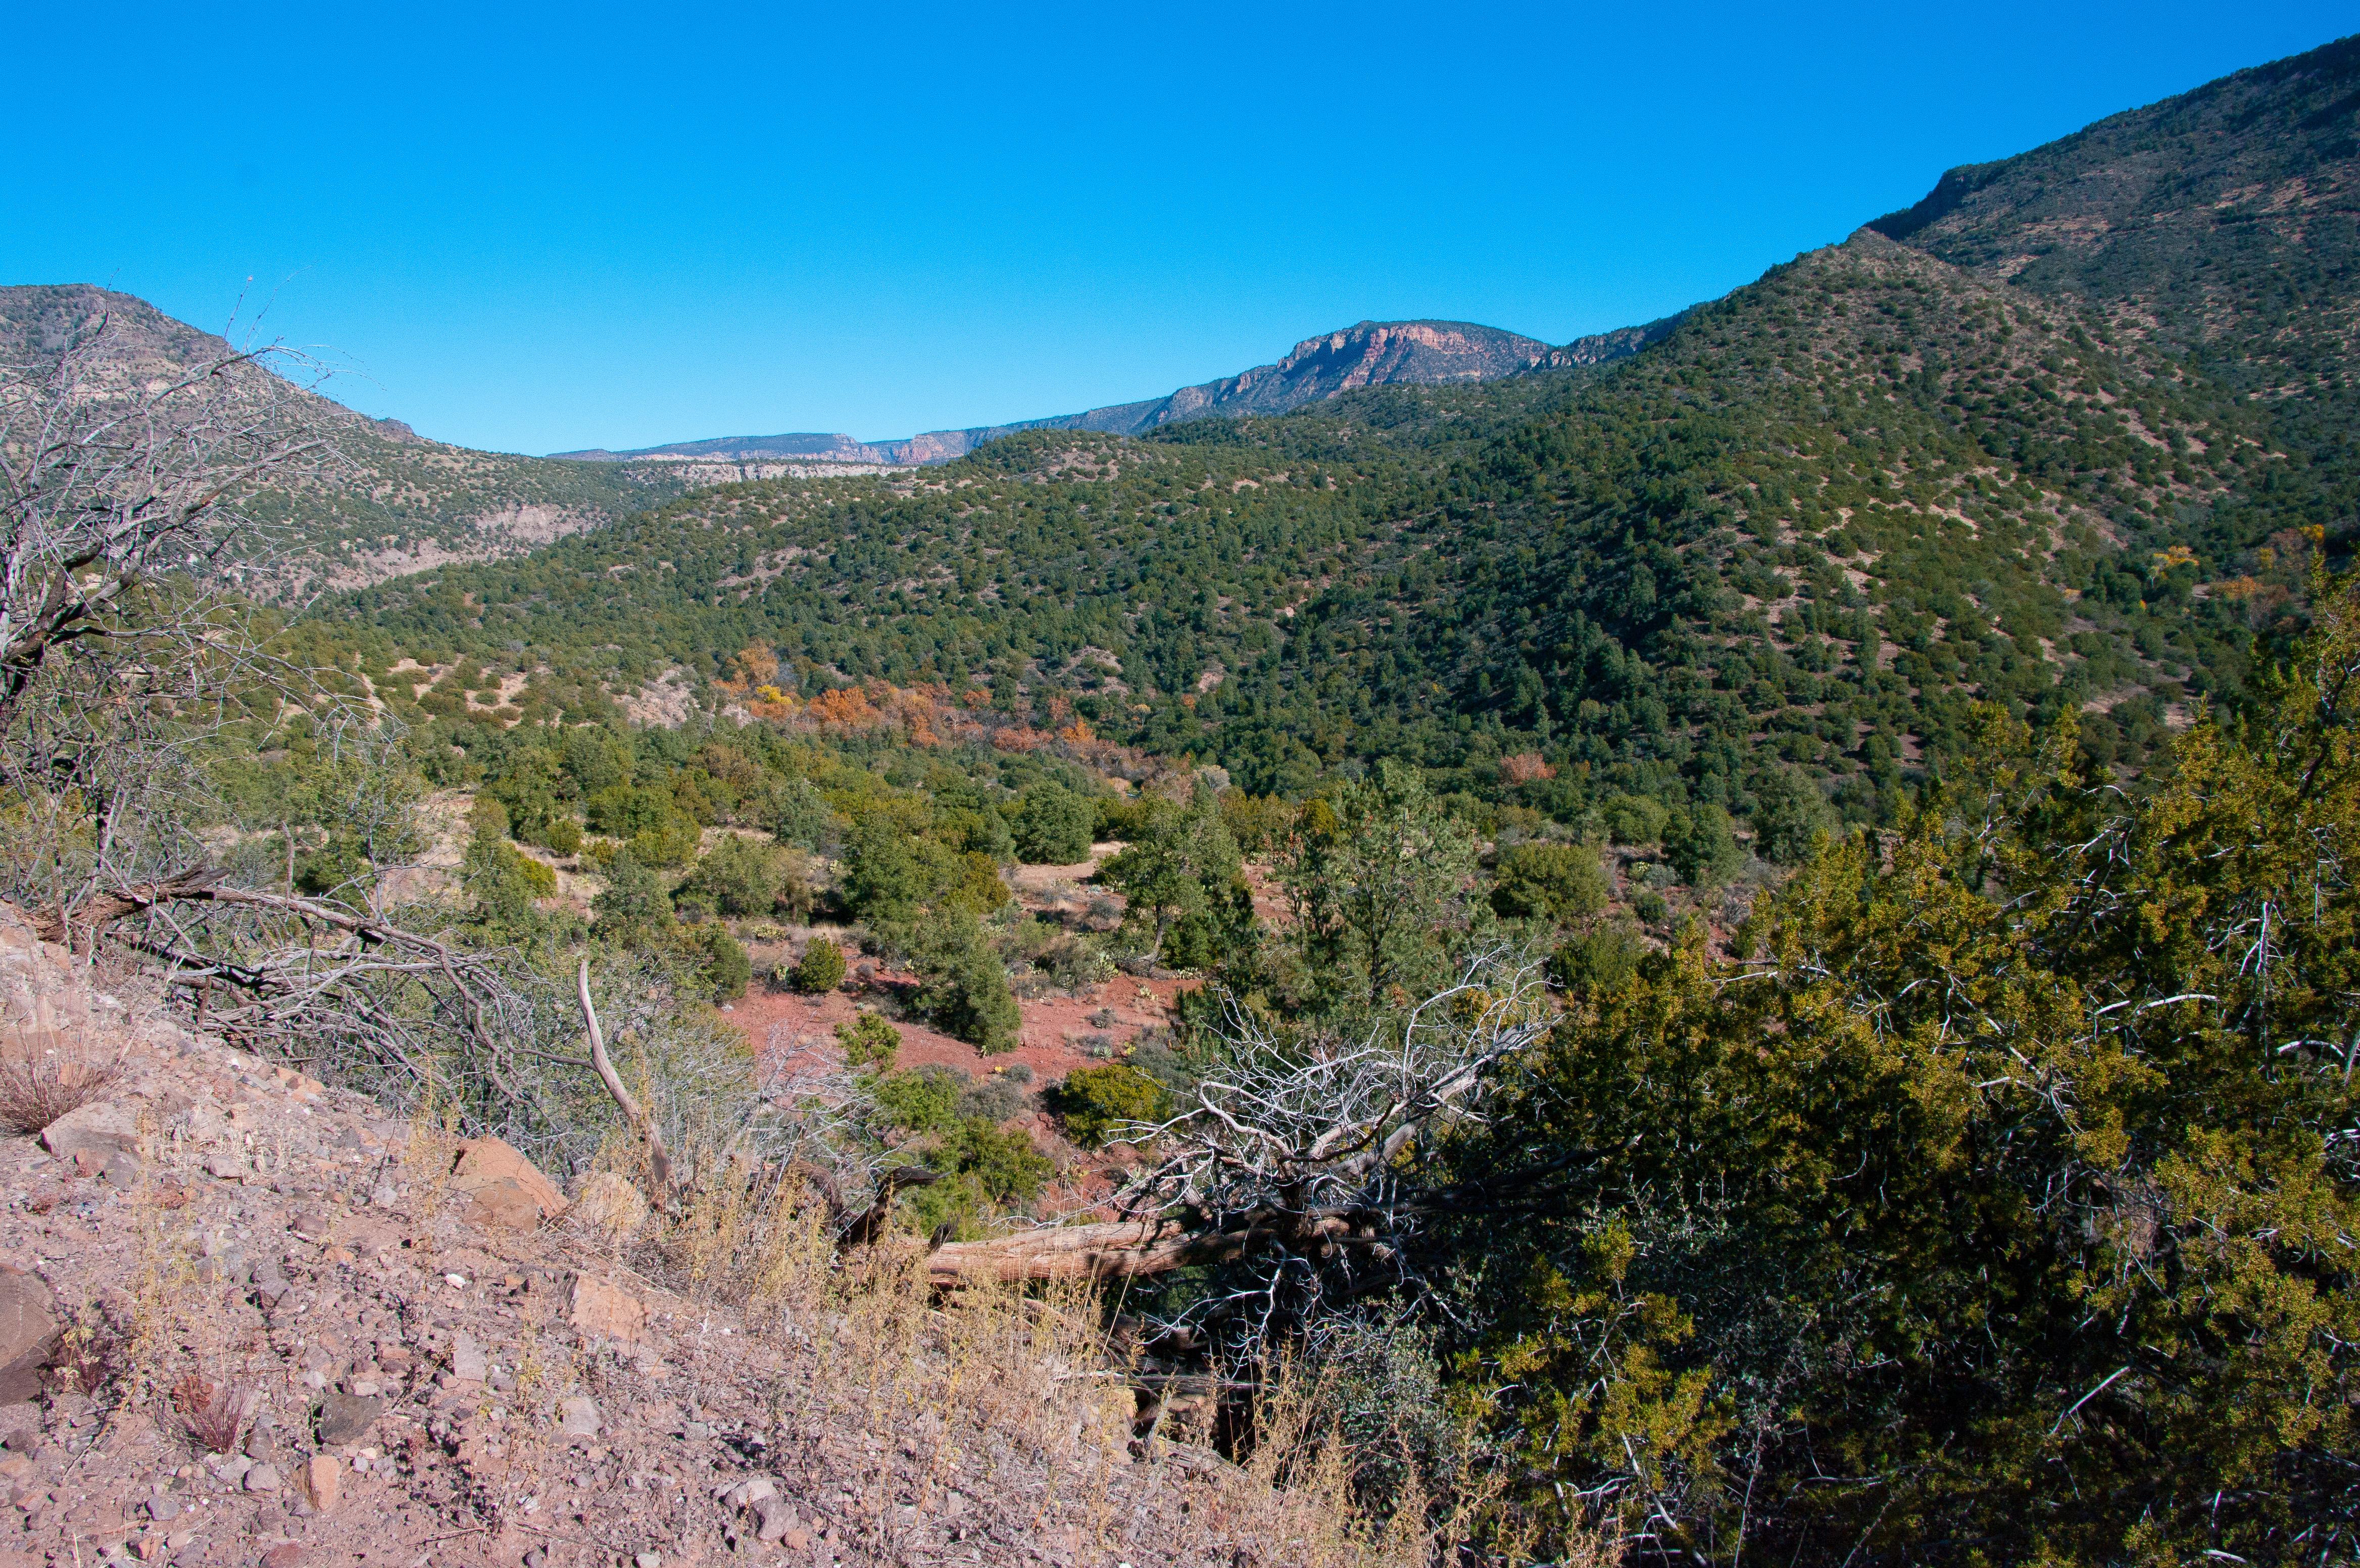 Camp Wood Az Elevation : Elevation of apache trail pine az usa topographic map